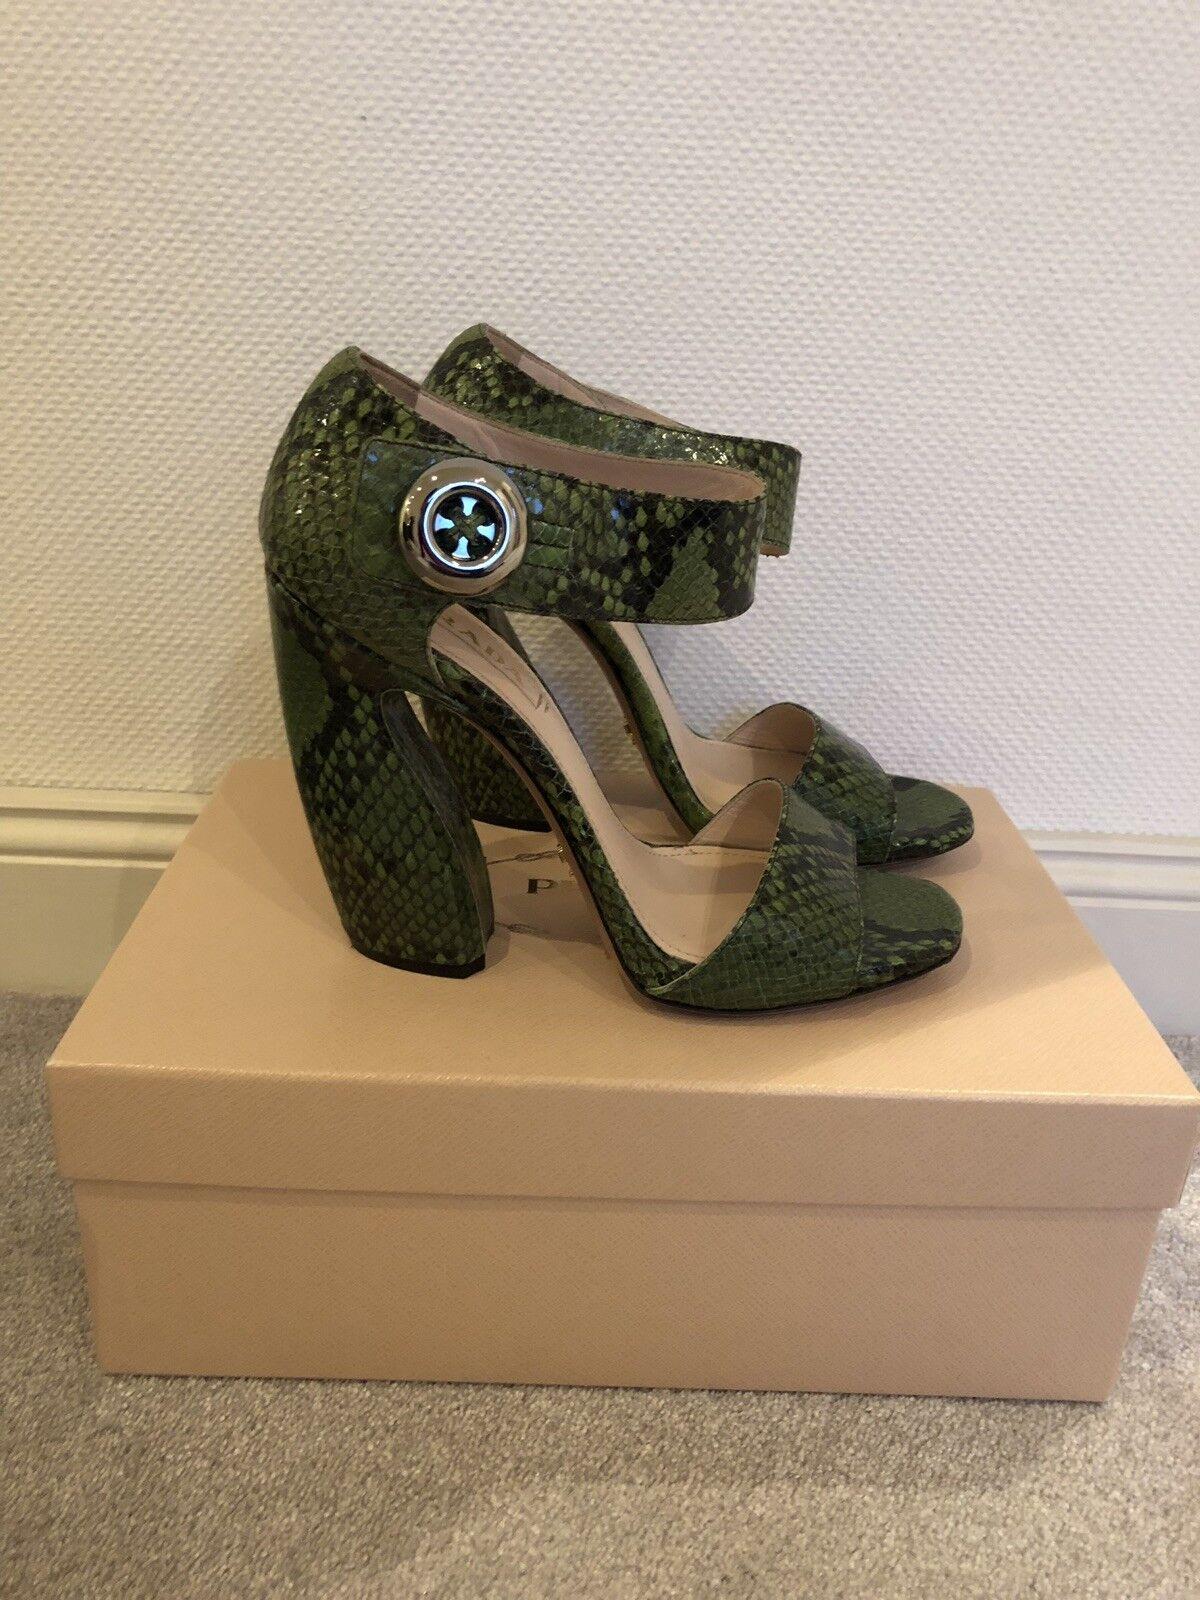 PRADA VERTE Sandales De Cuir Dans Serpent Optique, taille 39, vert Snake Sandals